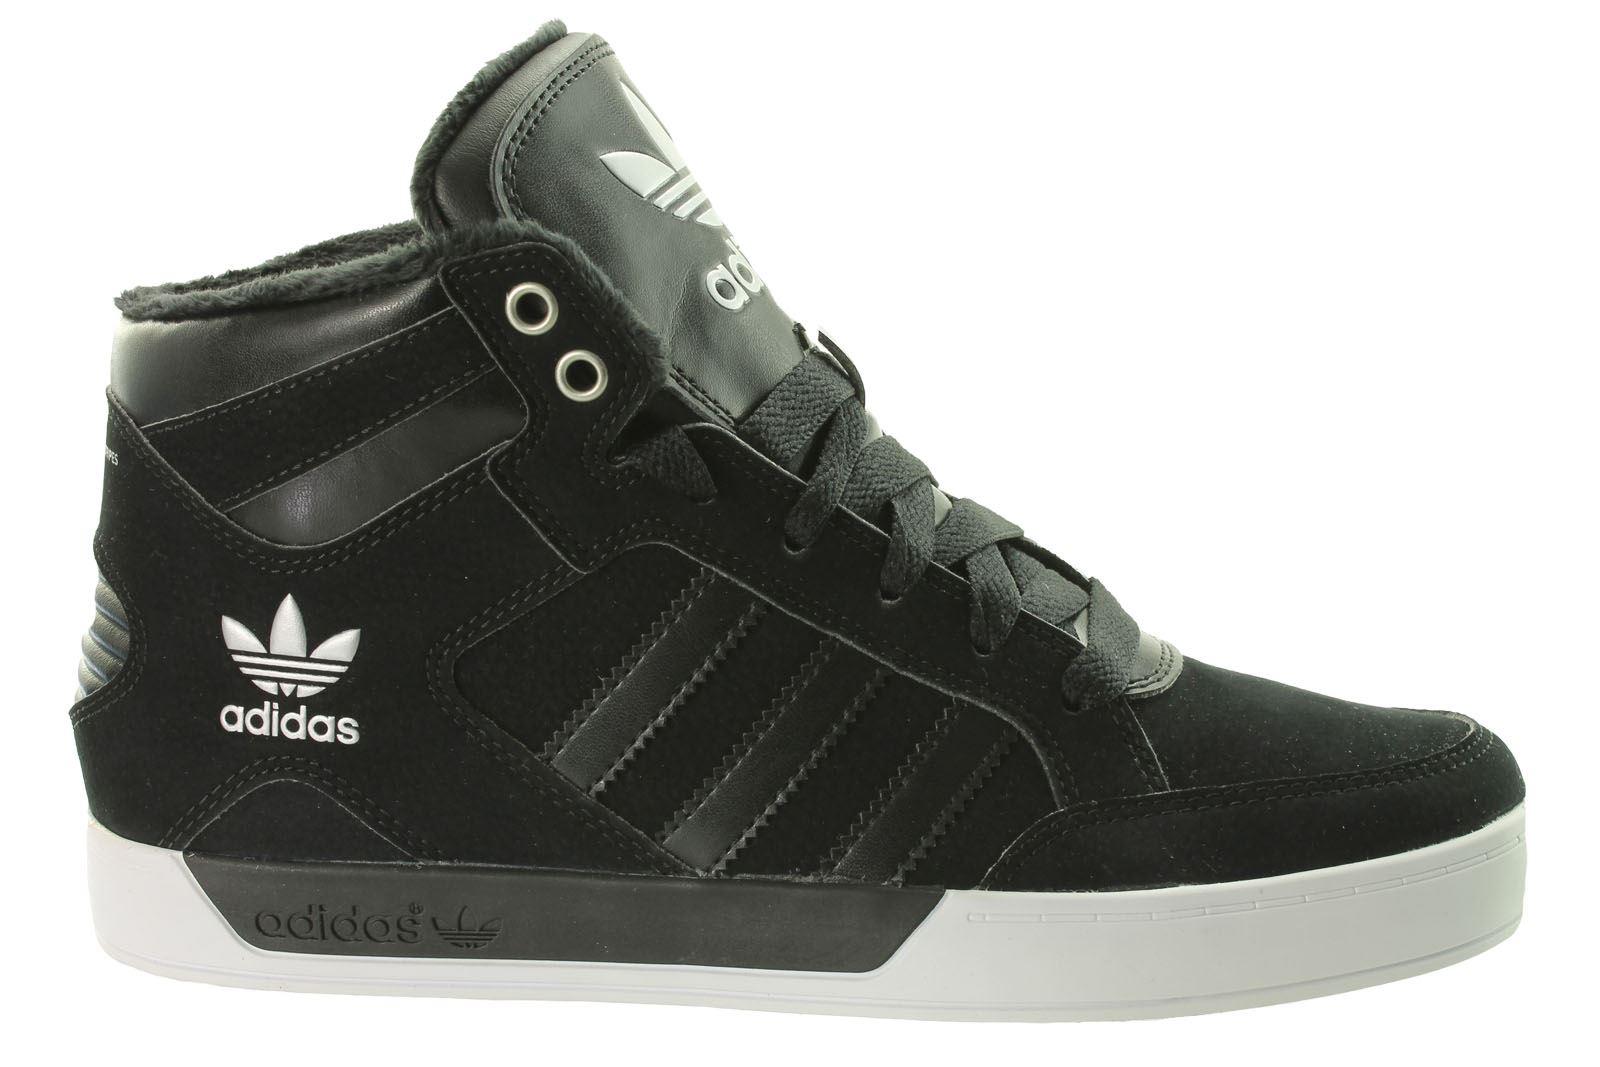 adidas hardcourt adidas-originals-hard-court-hi-boots-basketball-childrens- WUIJTEH